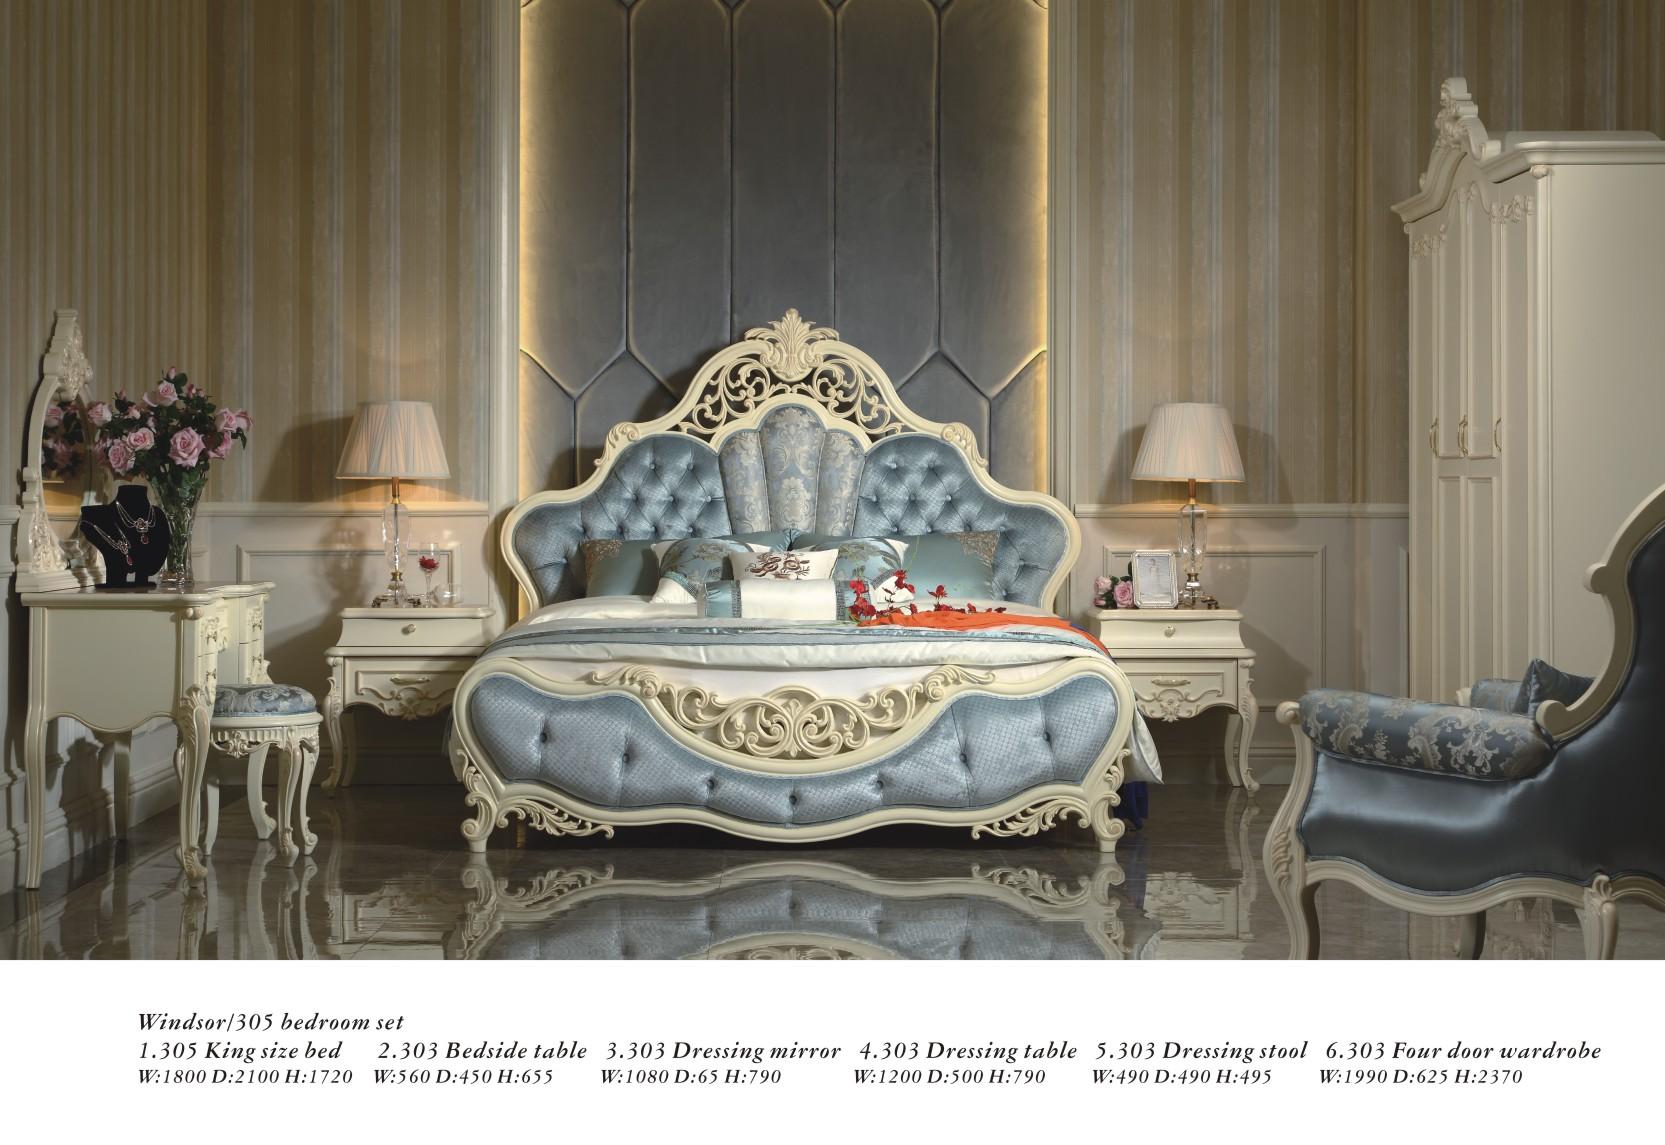 Windsor Bedroom Set